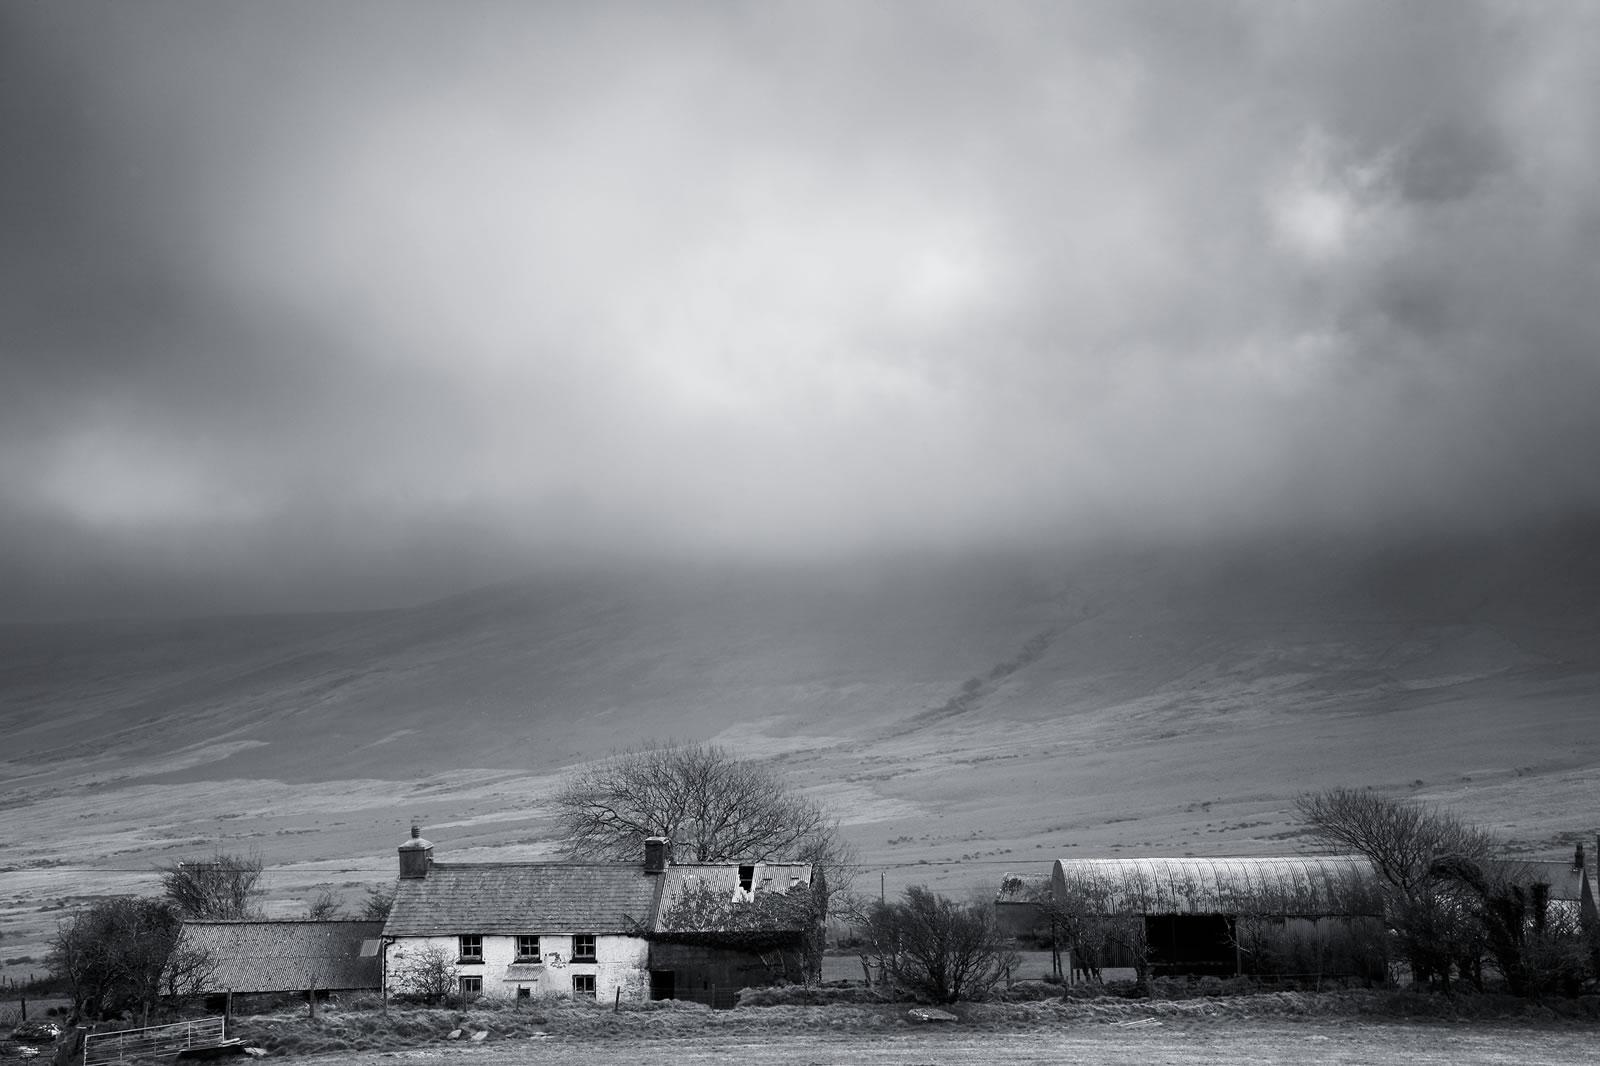 Abandoned-Farm-The-Preseli-Hills-Pembrokeshire-1